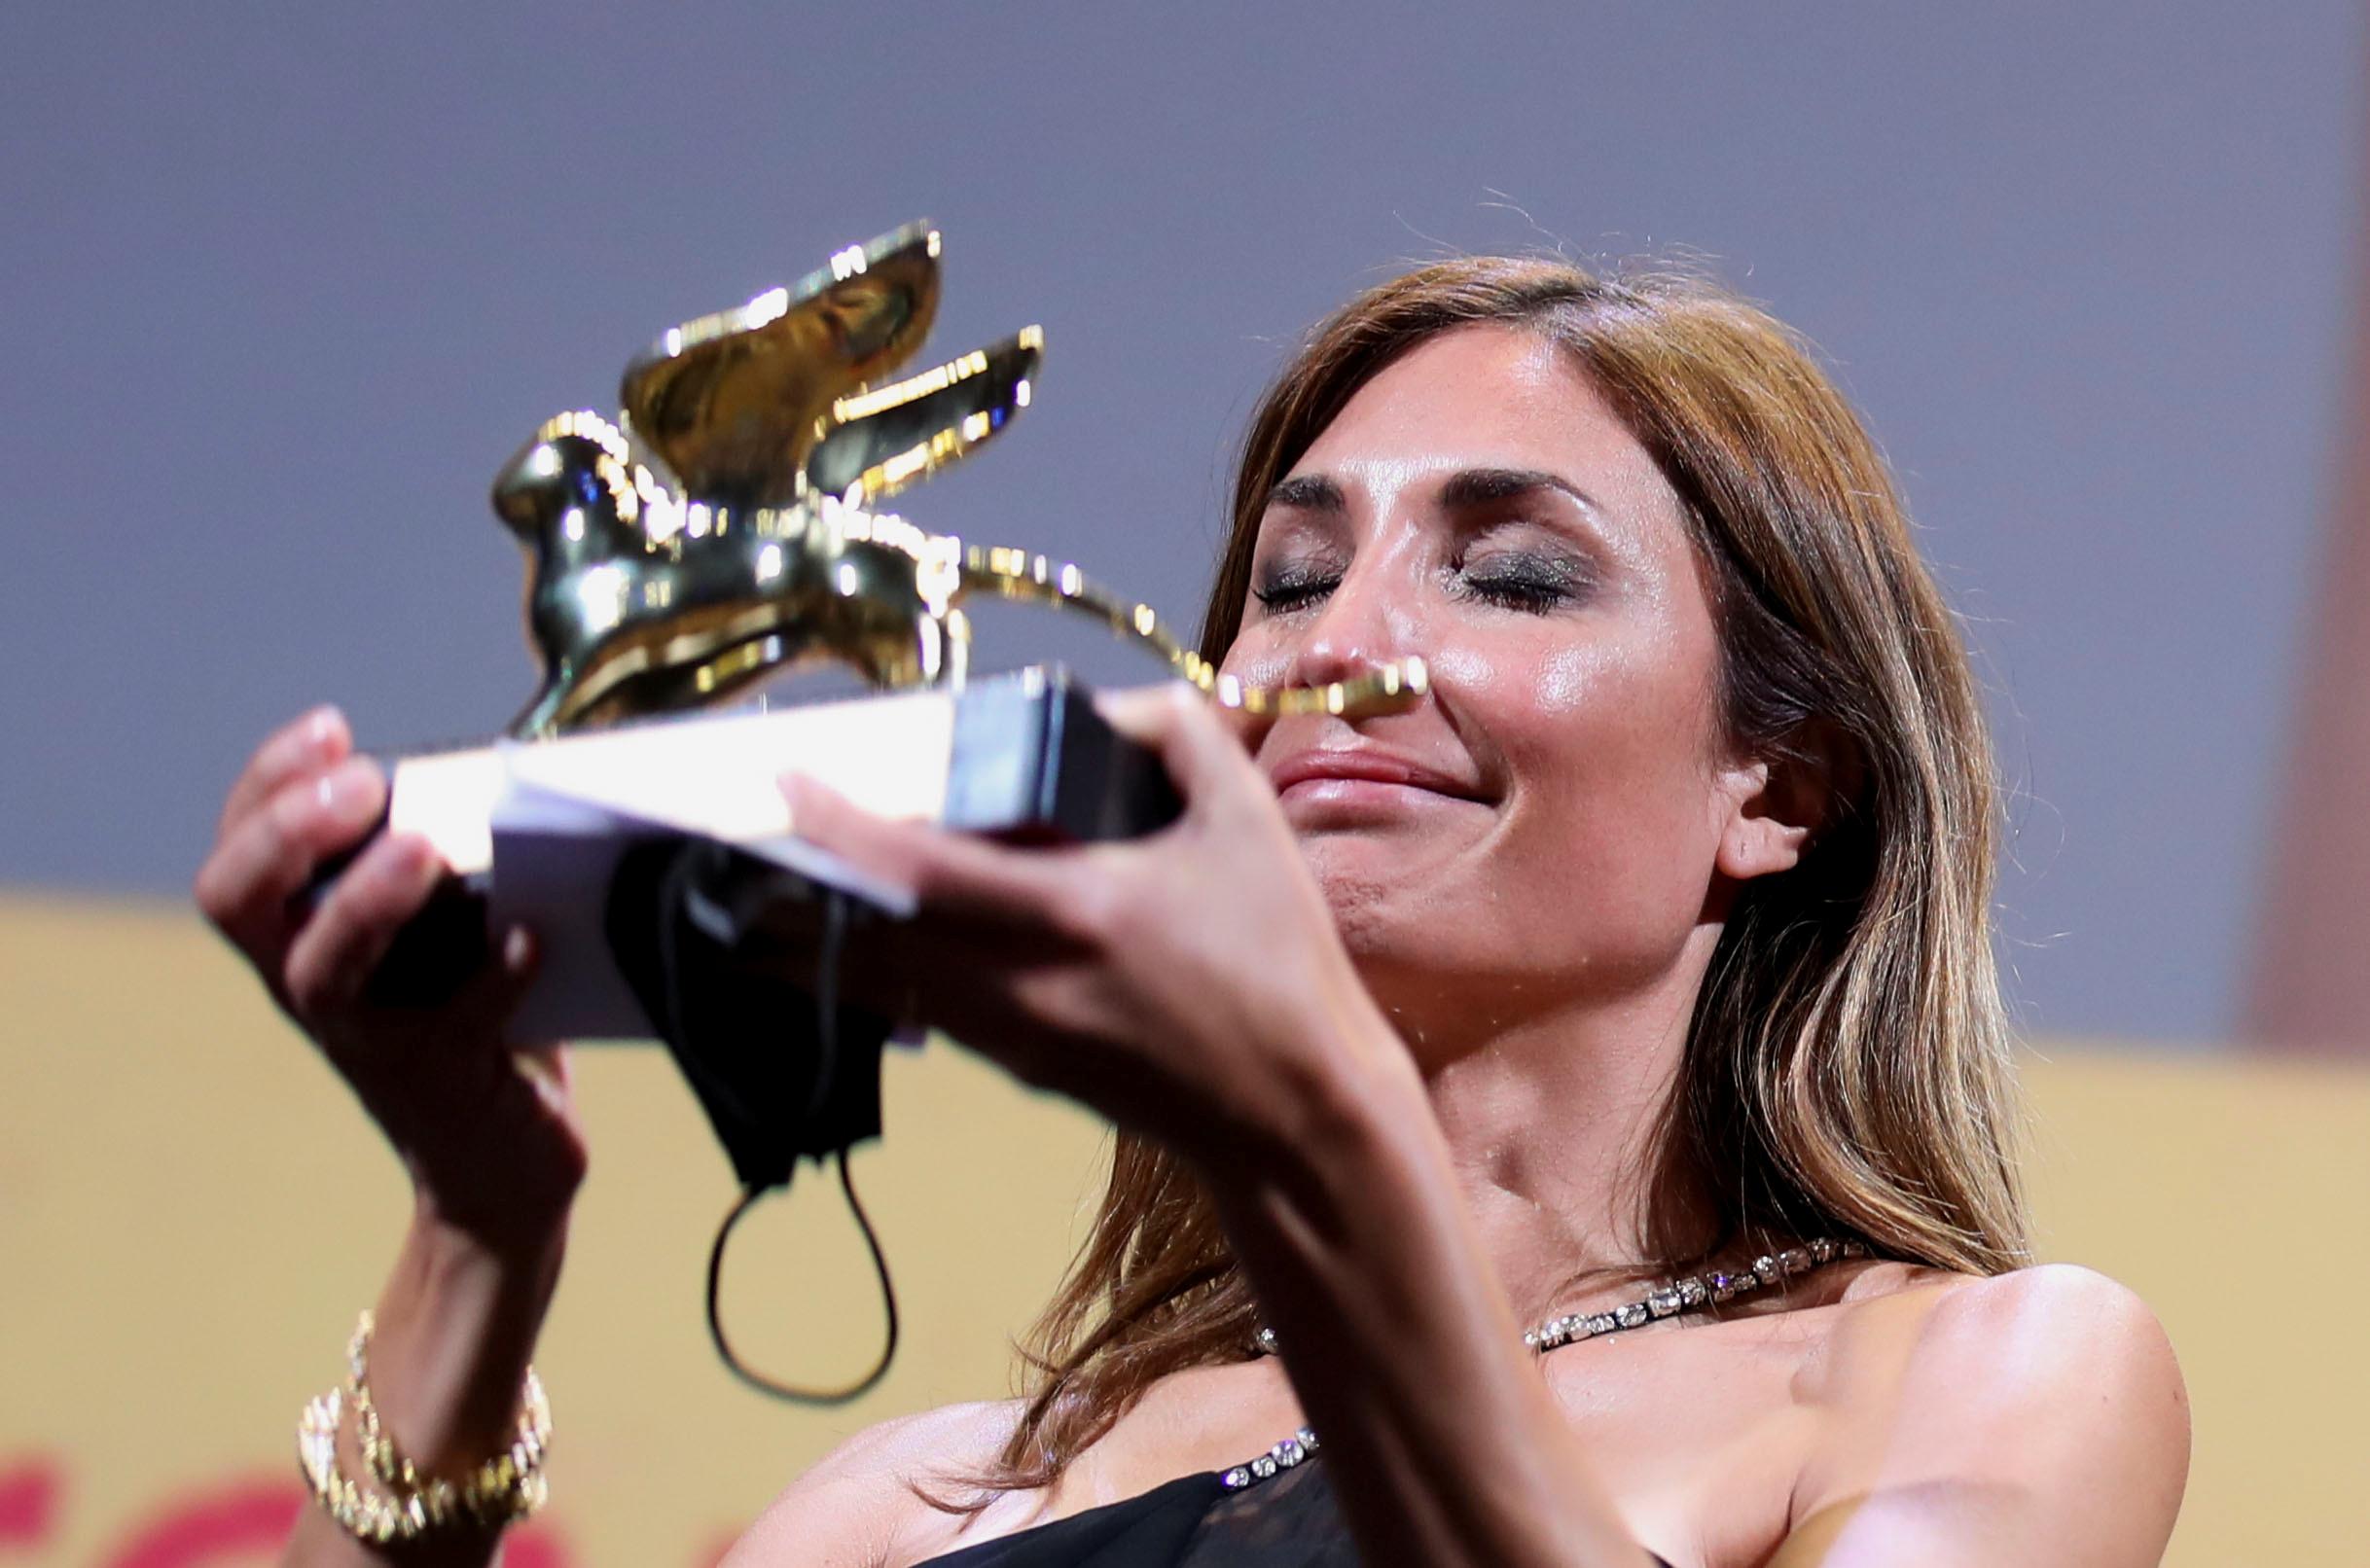 The 78th Venice Film Festival - Awards Ceremony - Venice, Italy, September 11, 2021 - Director Audrey Diwan receives the Golden Lion award for Best Film. REUTERS/Yara Nardi